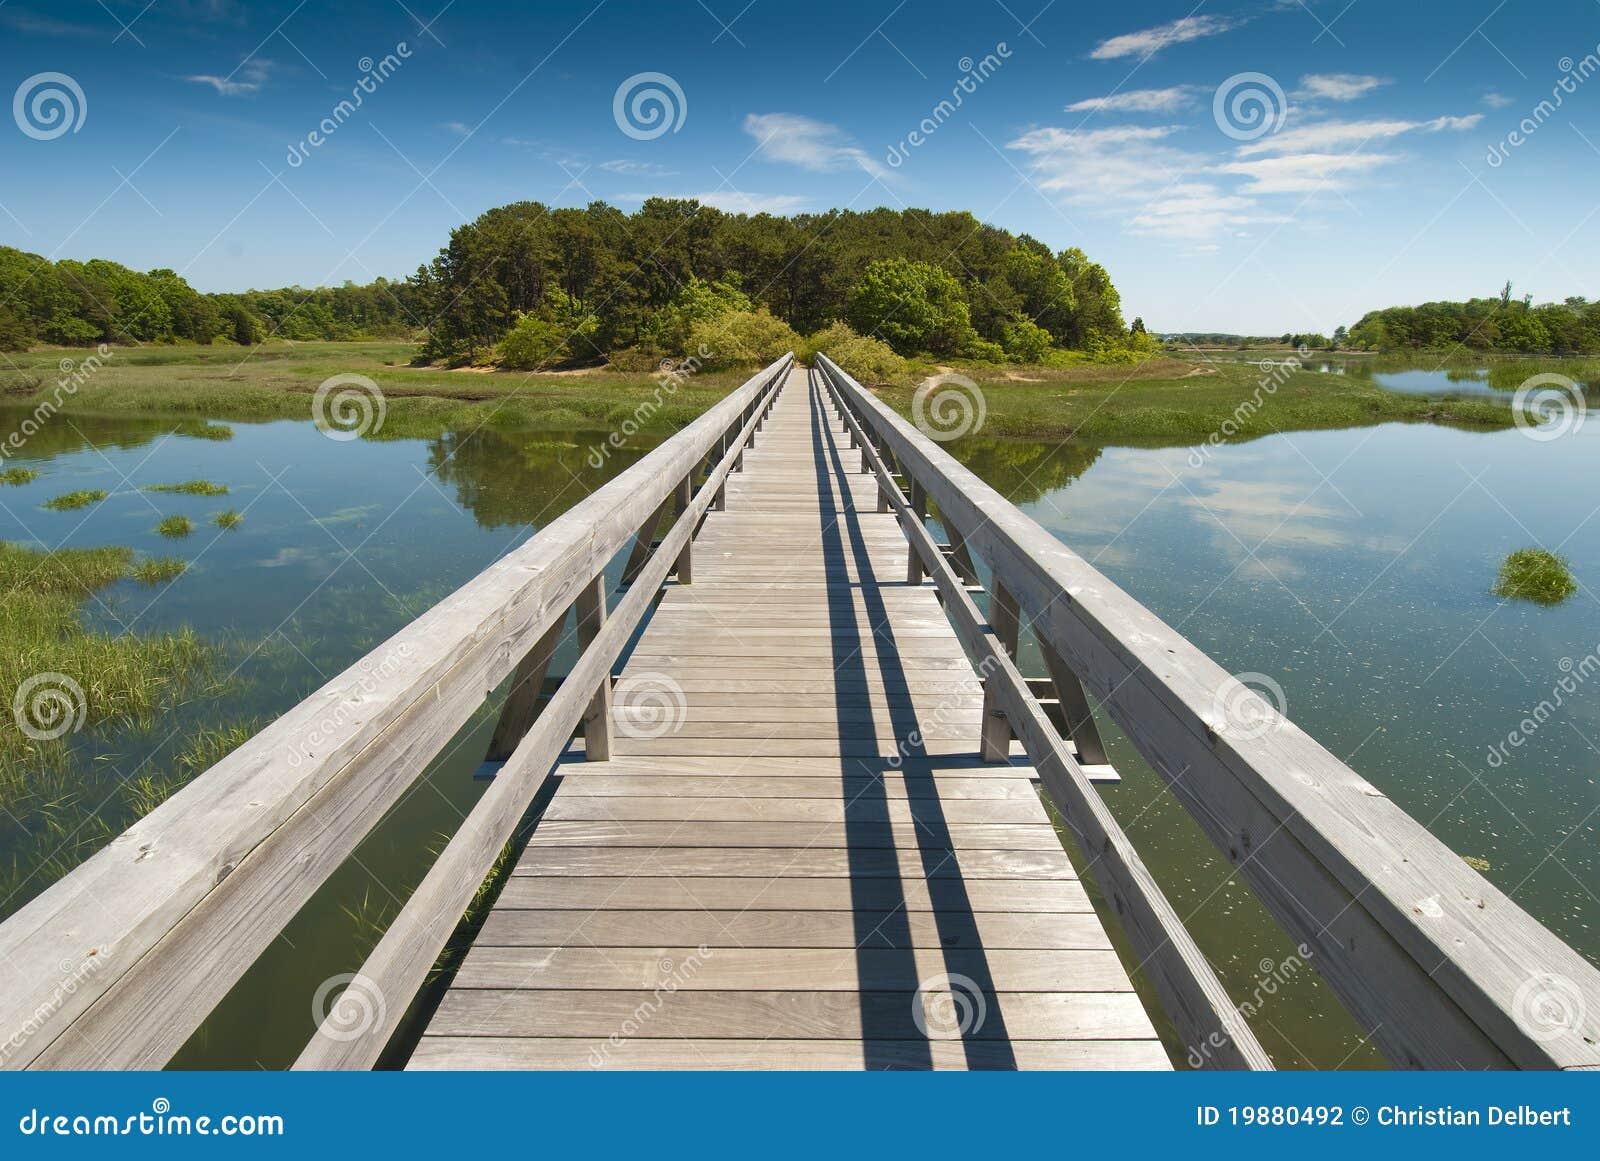 Wooden Bridge In Perspective Stock Photography - Image ...